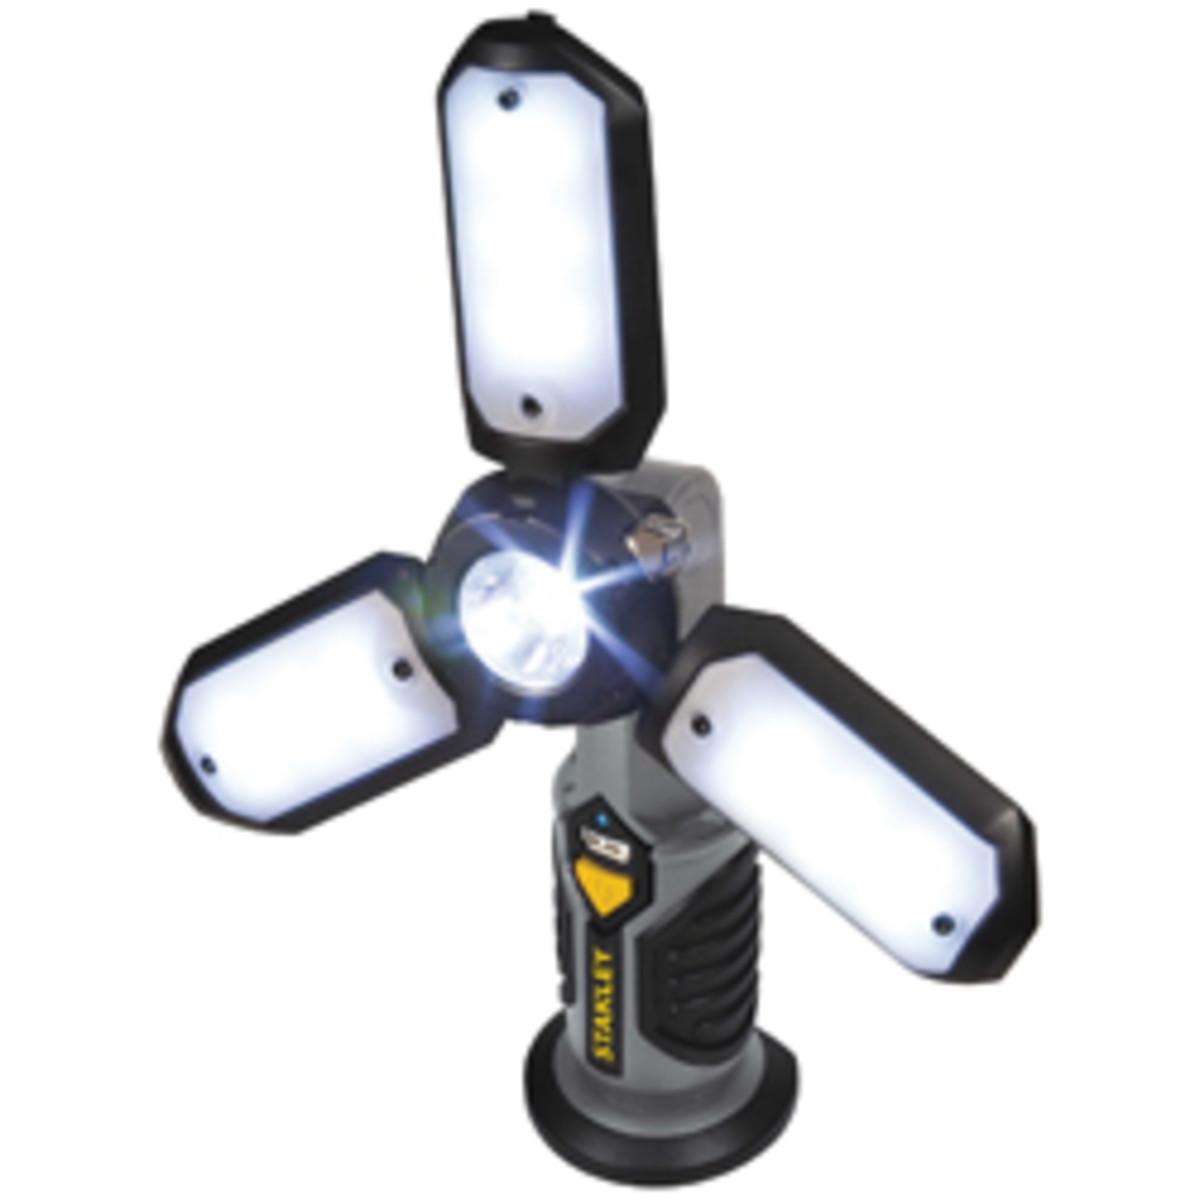 Stanley's Satellite worklight.